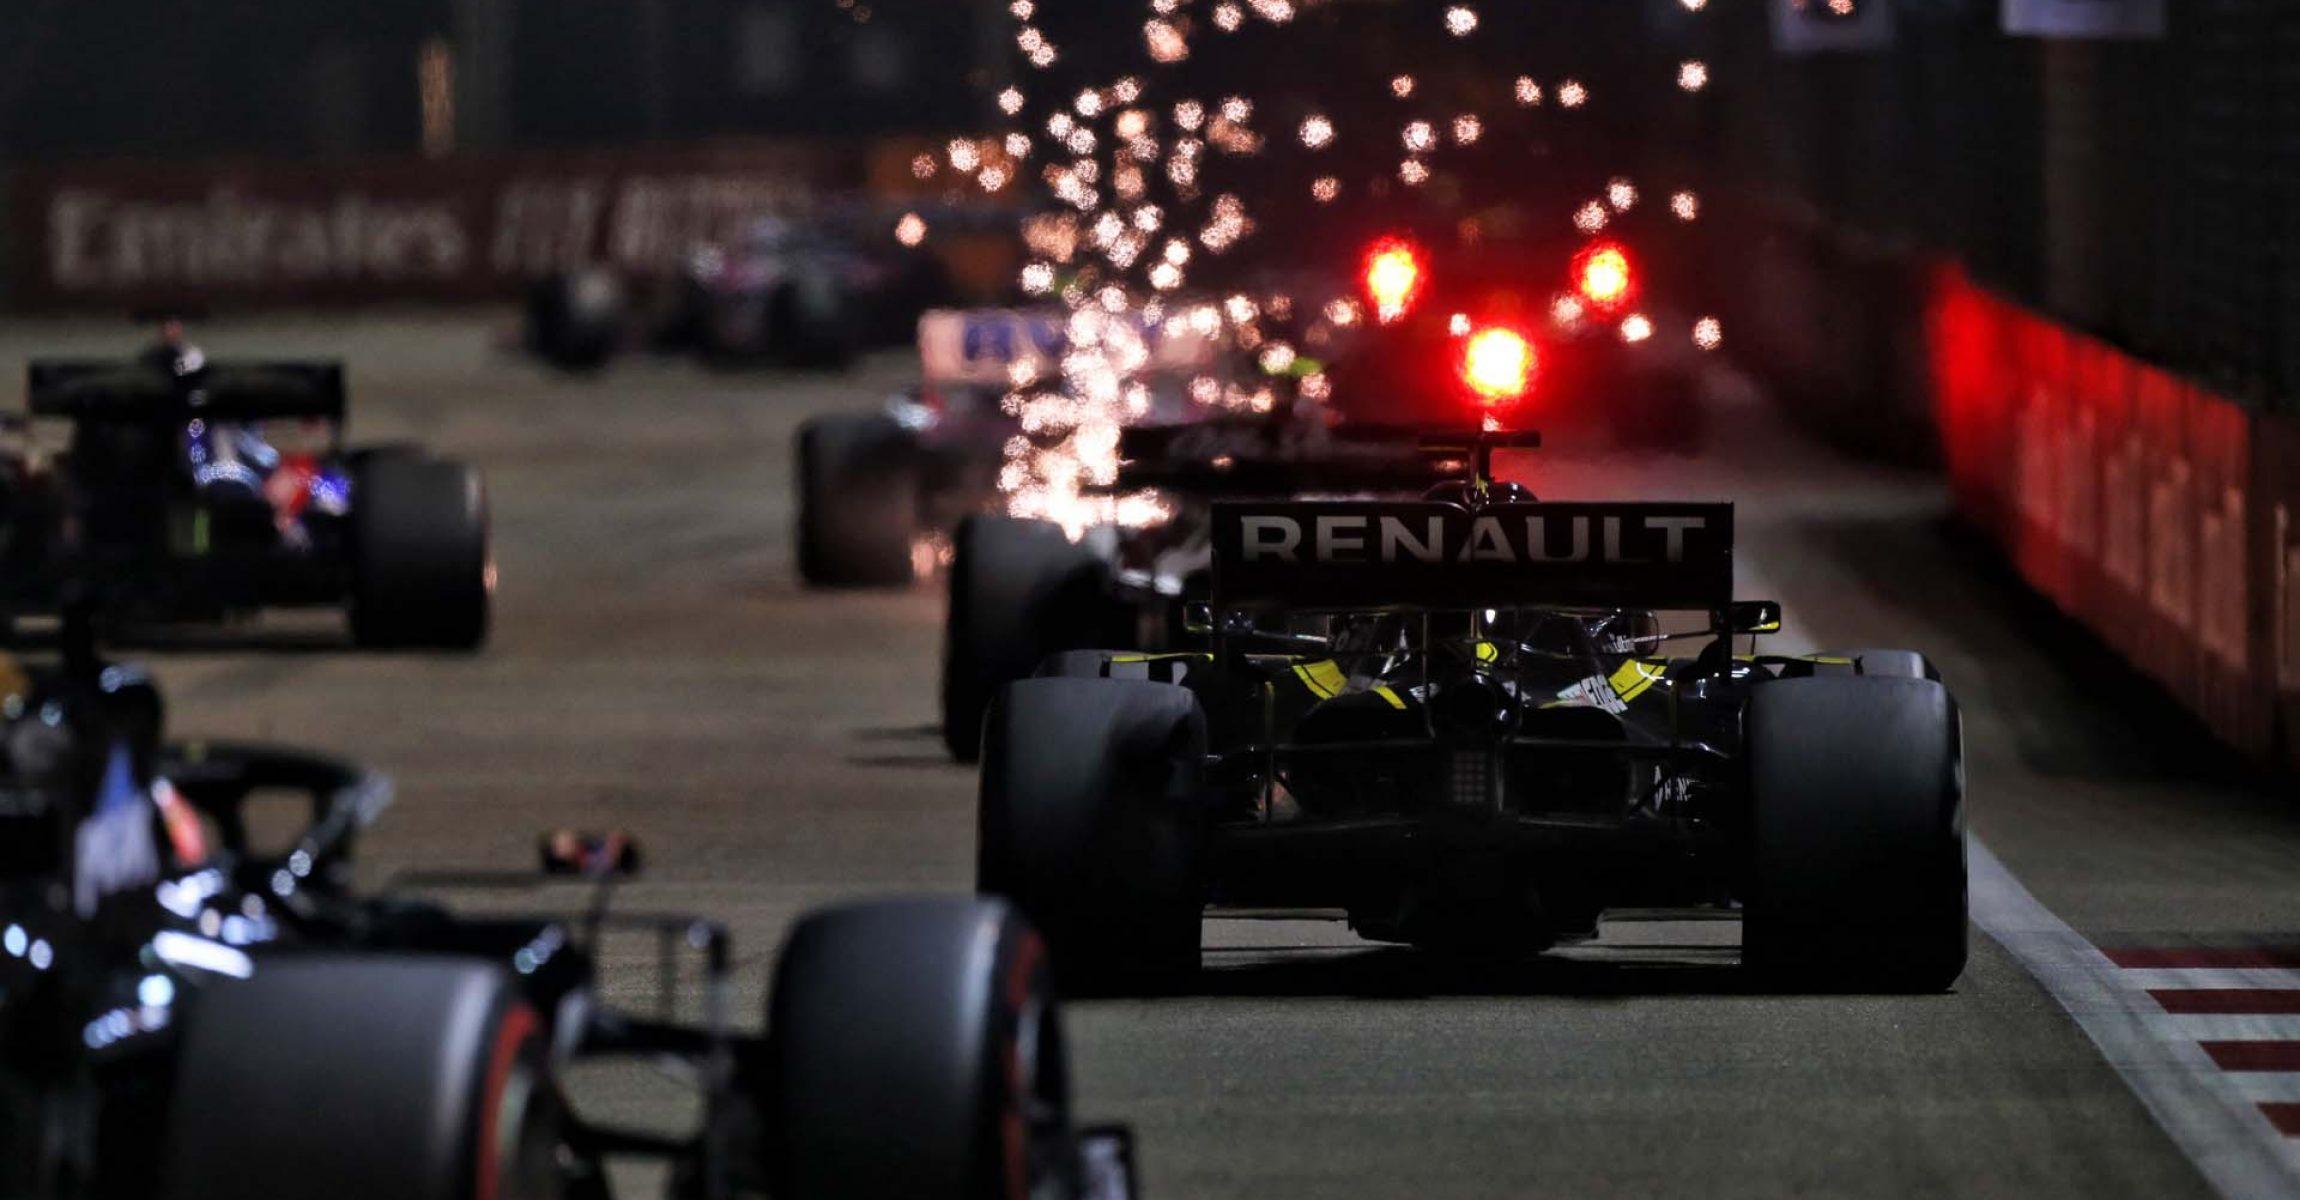 Daniel Ricciardo (AUS) Renault F1 Team RS19. Singapore Grand Prix, Sunday 22nd September 2019. Marina Bay Street Circuit, Singapore.